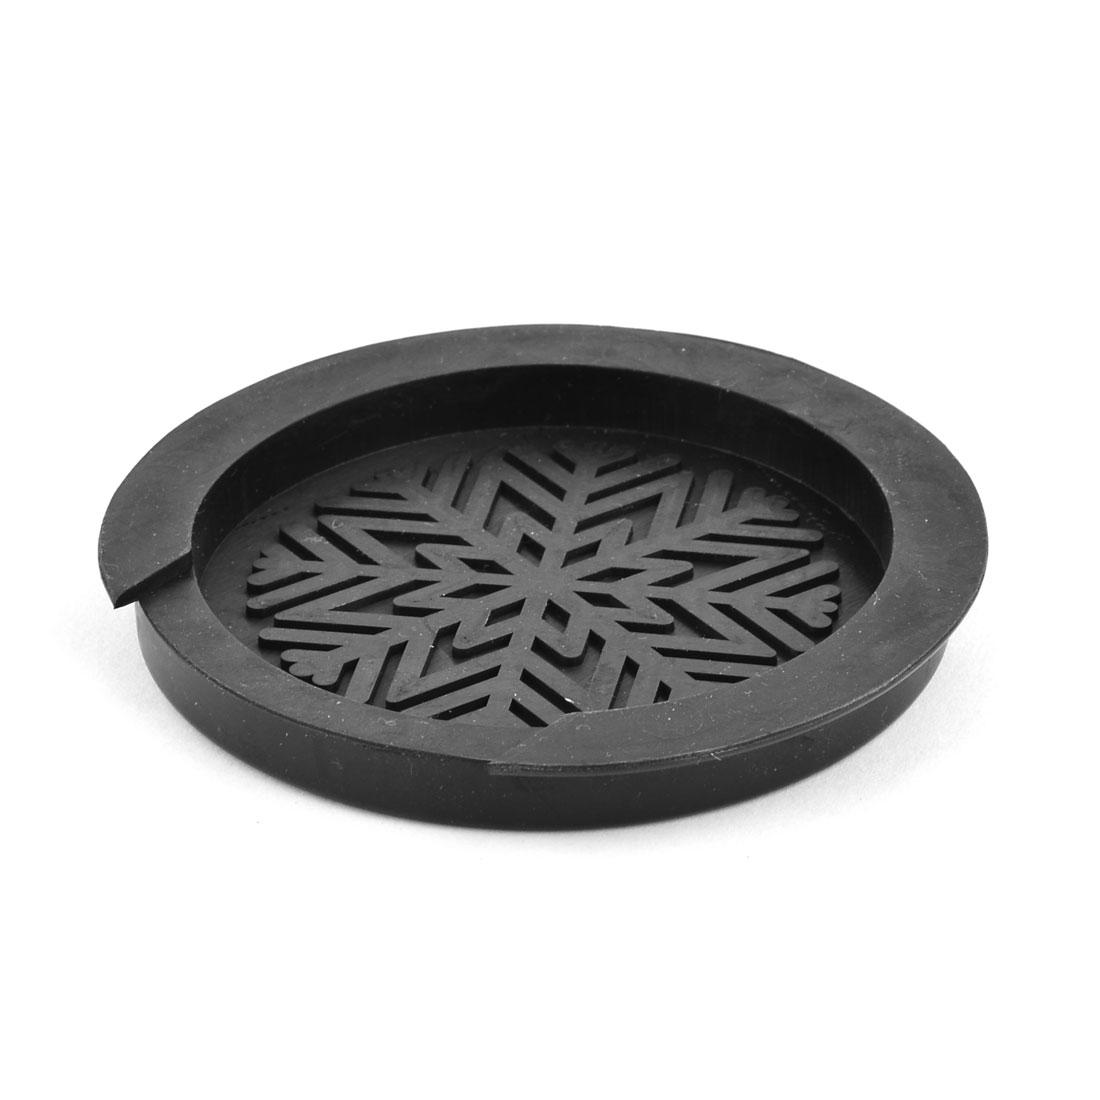 Bass Rubber Snowflake Pattern Block Plug Guitar Sound Hole Cover 11cm Dia Black